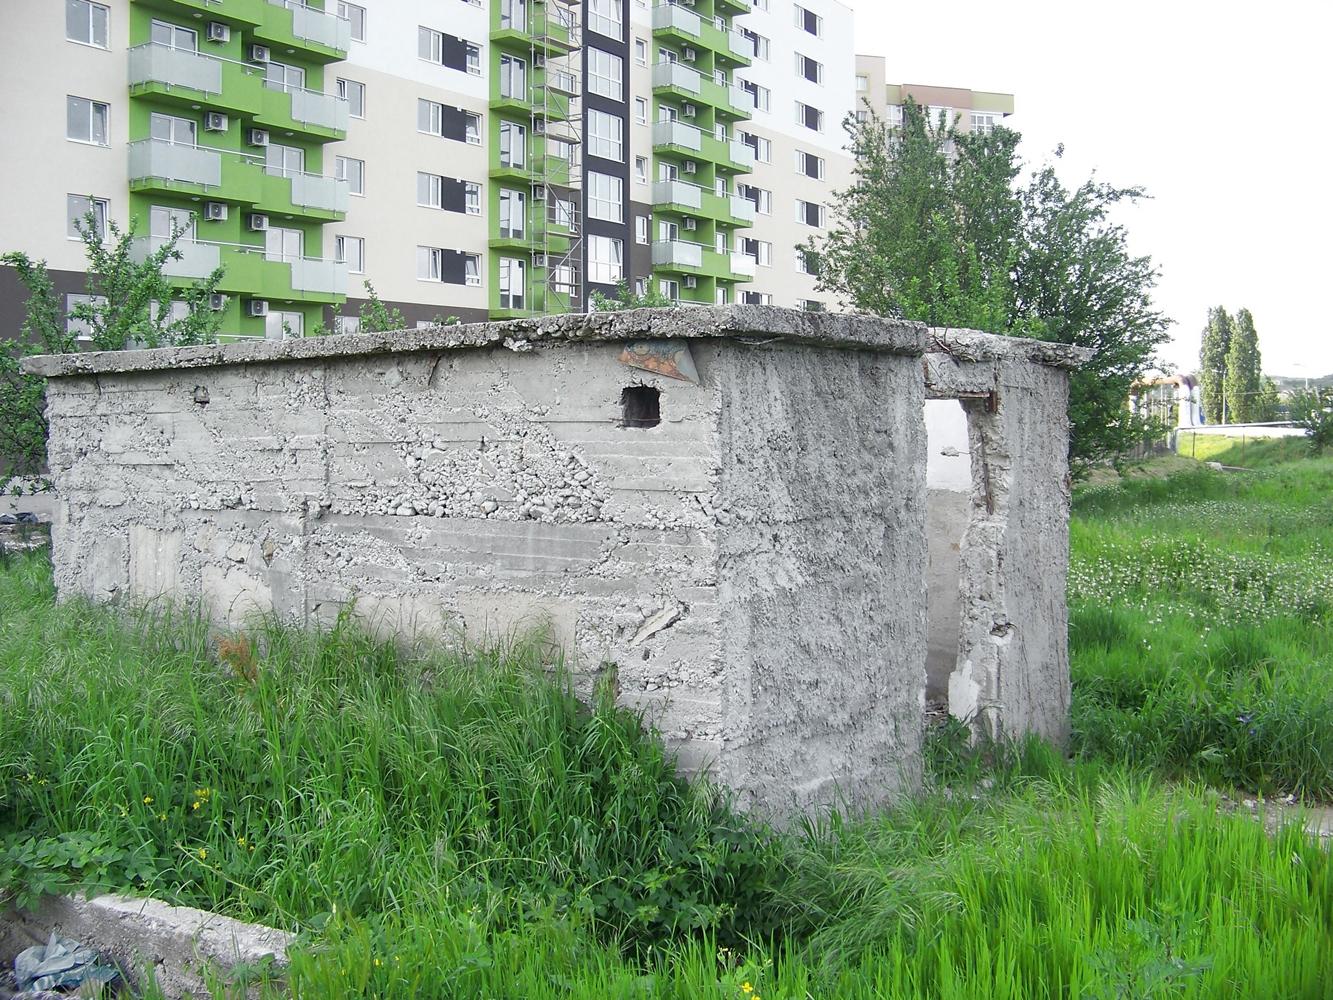 Abandoned building, Abandoned, Building, Concrete, Stone, HQ Photo